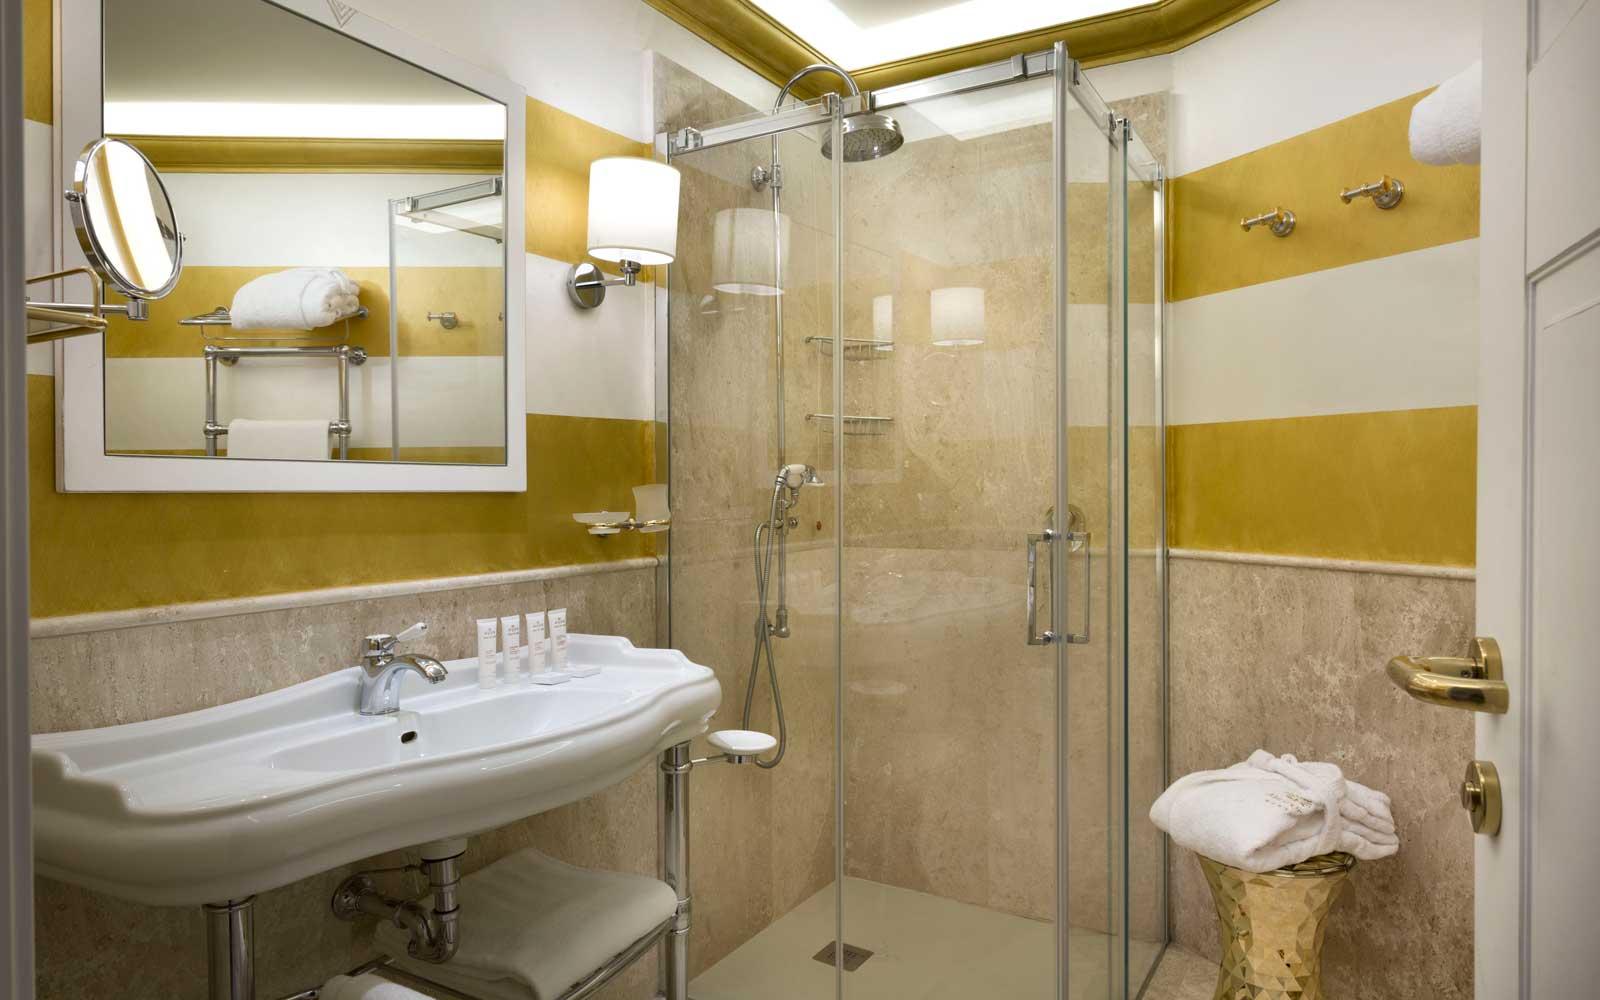 Deluxe Room Bathroom at Hotel Abi D'oru